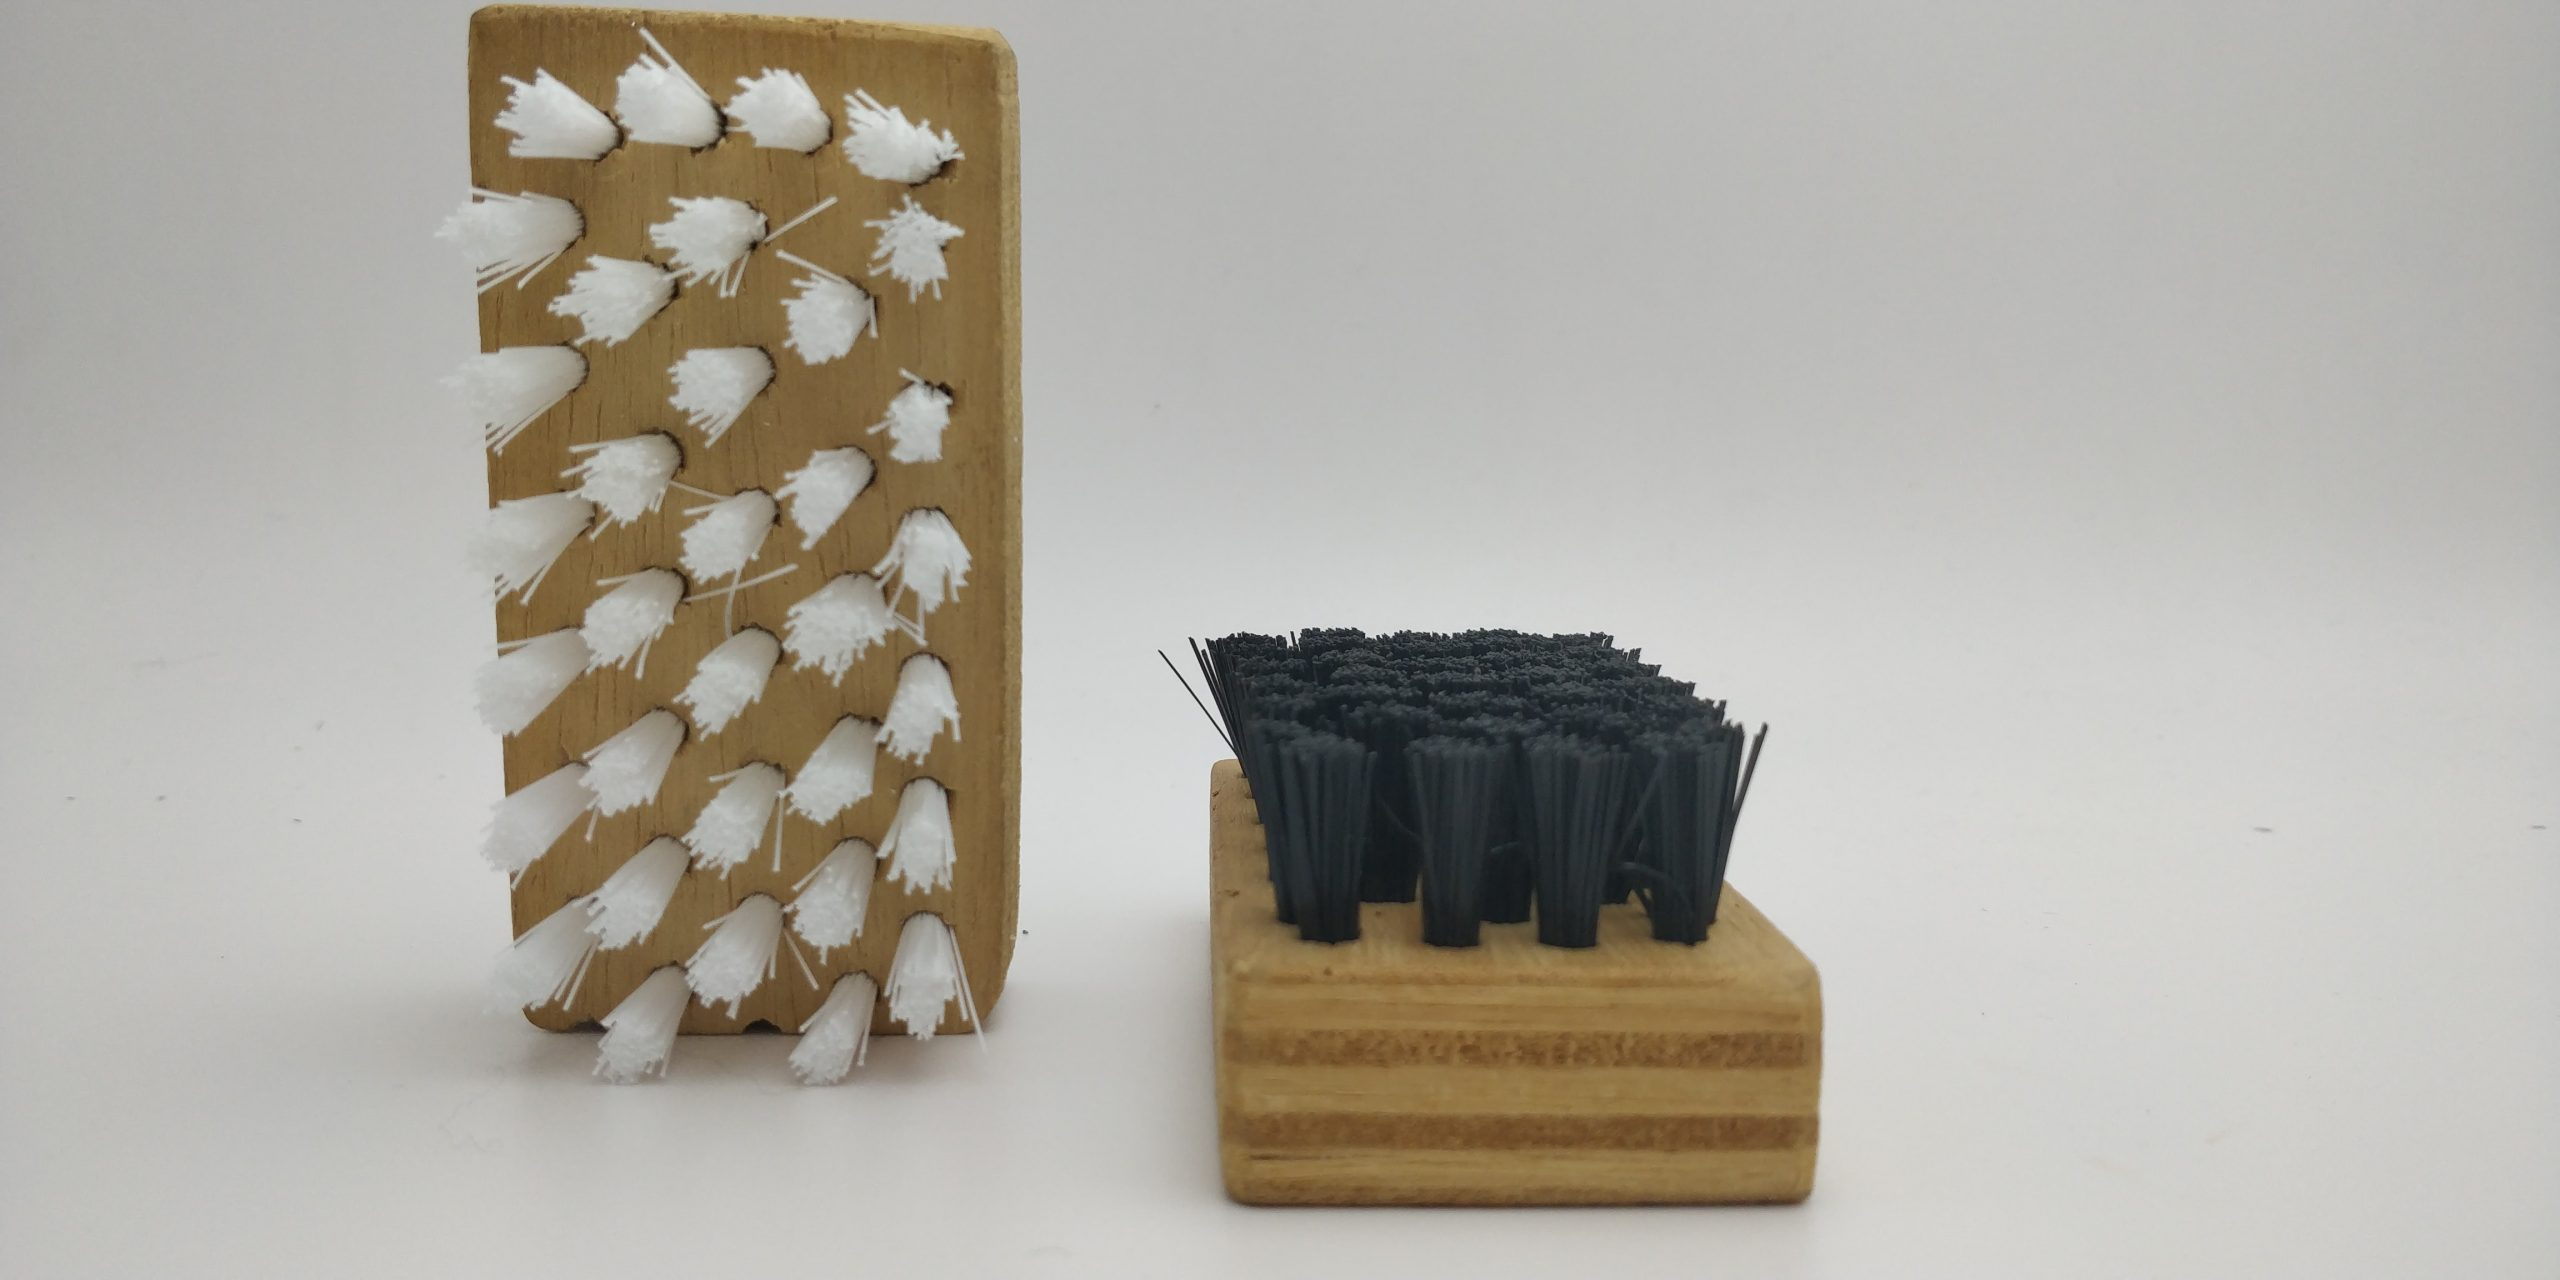 cepillo liston madera